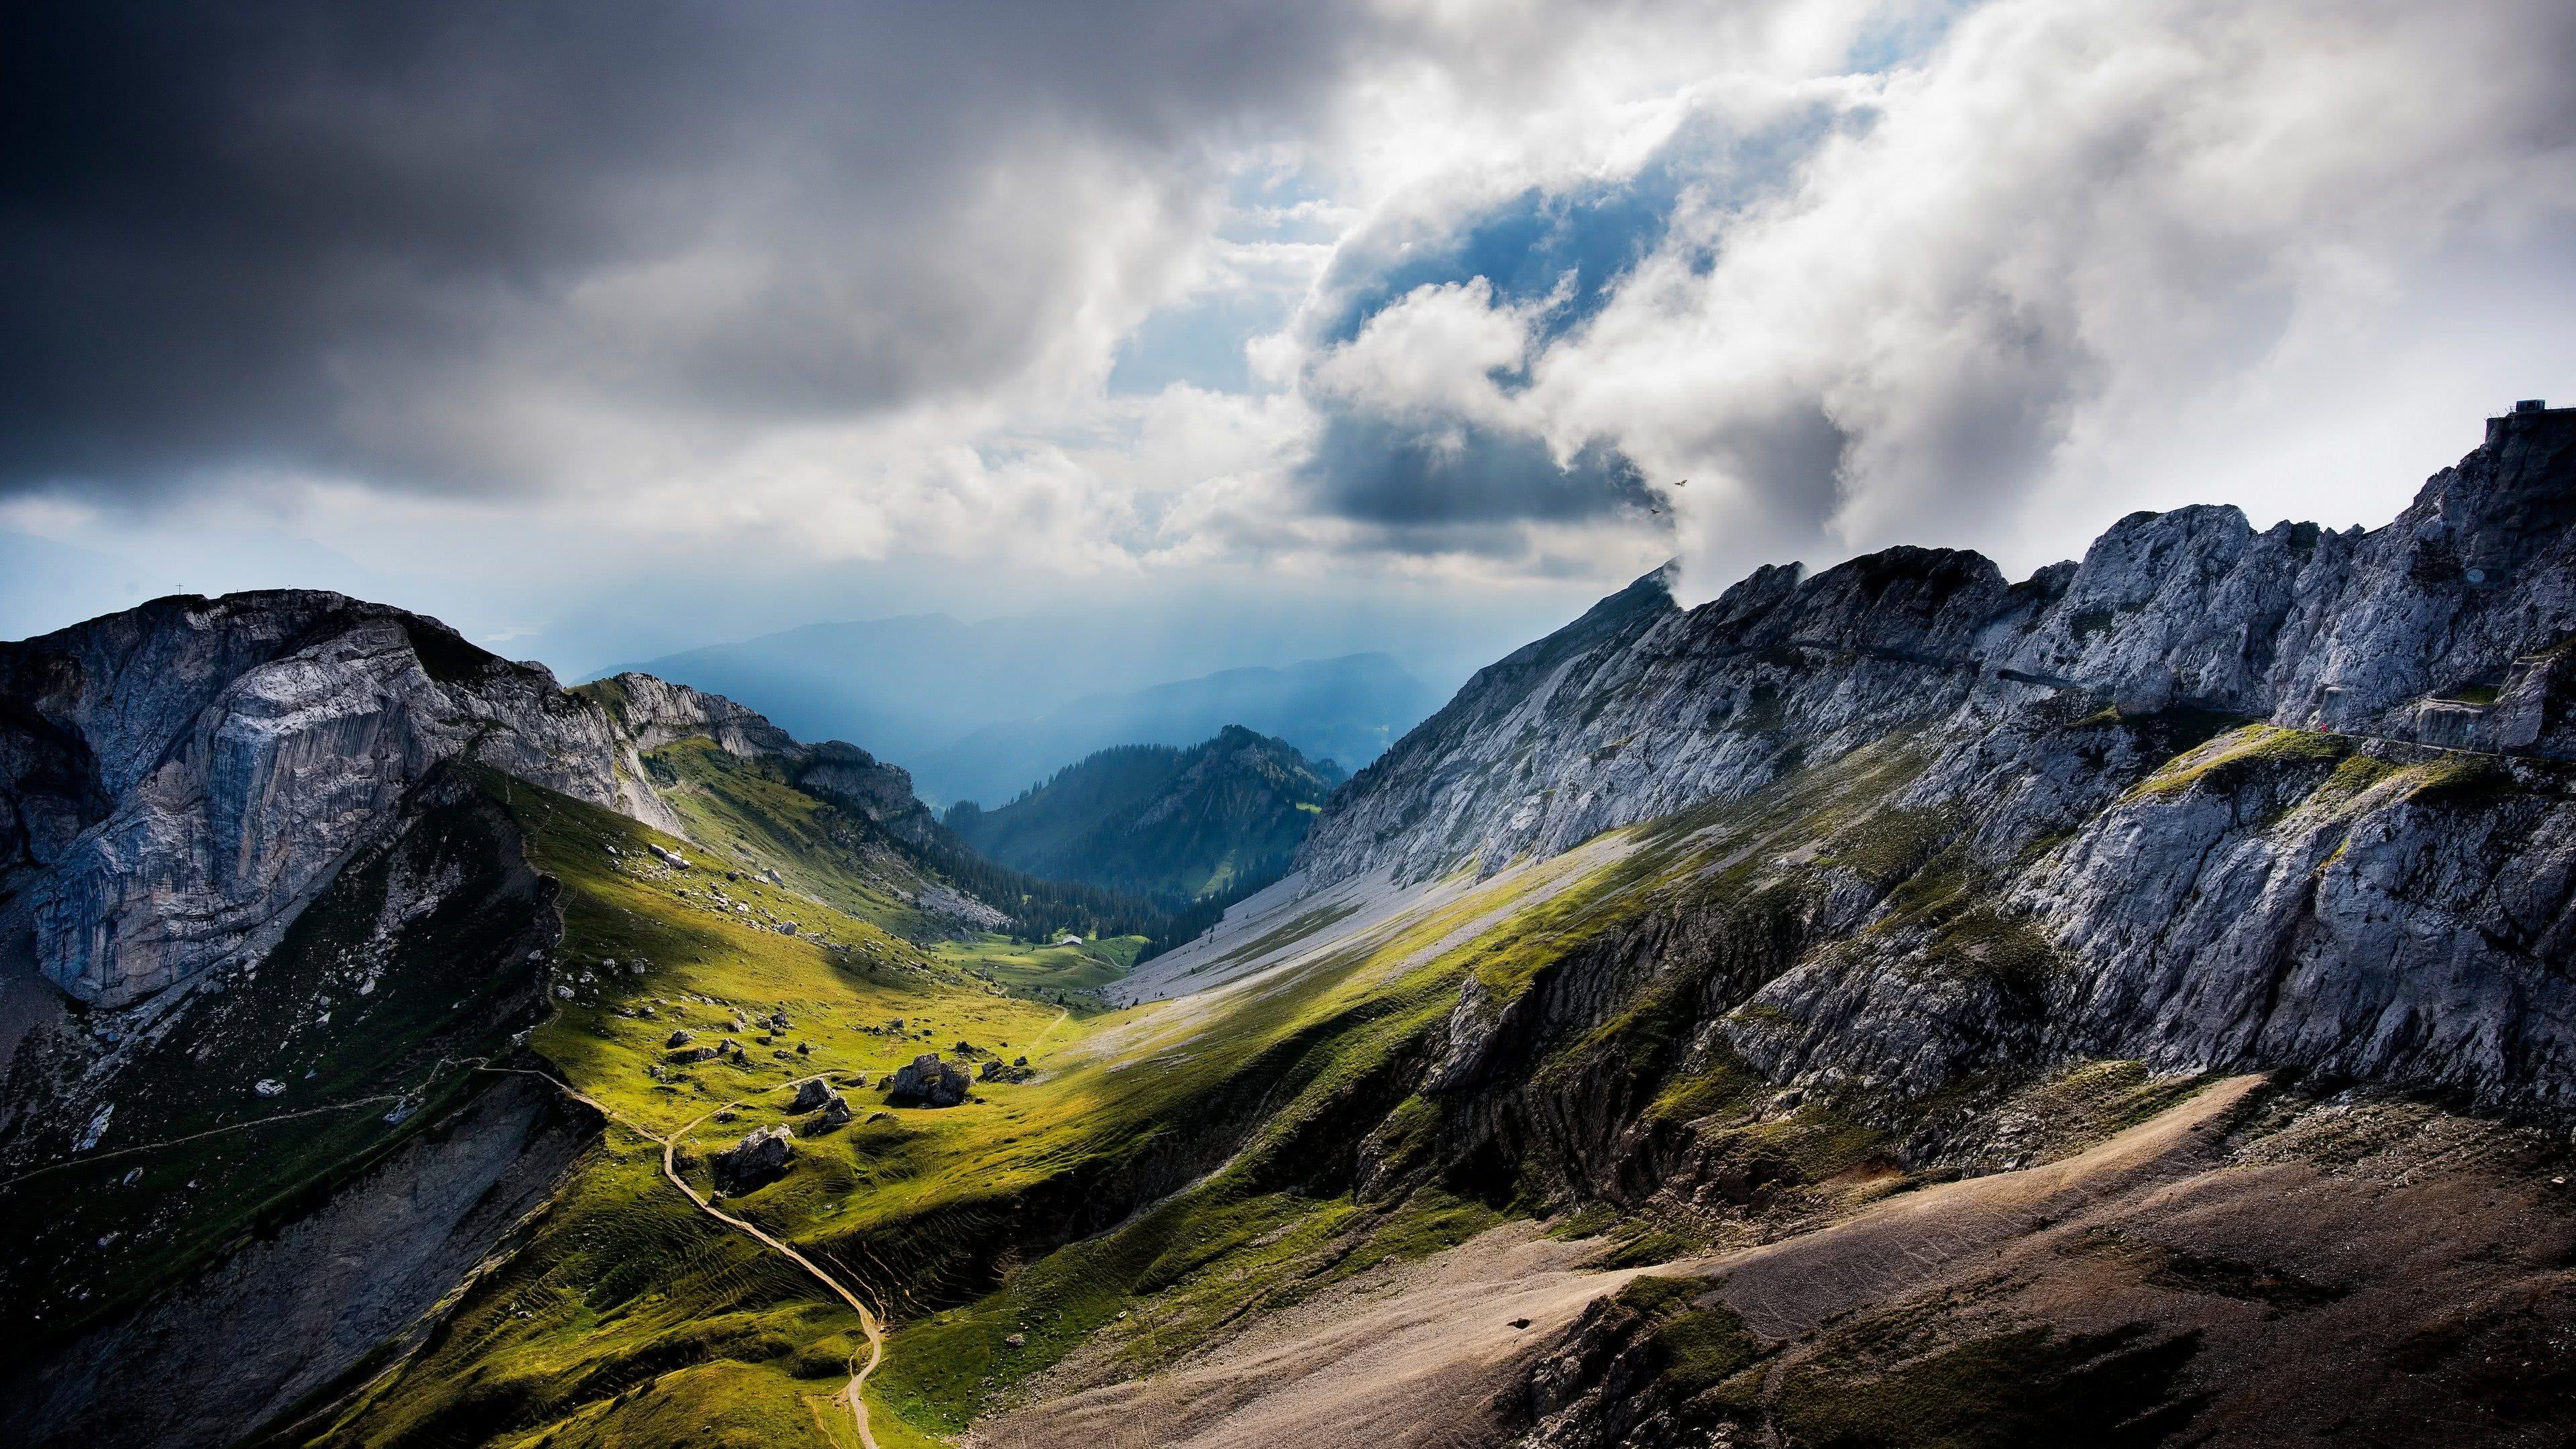 mountain range switzerland uhd 4k wallpaper